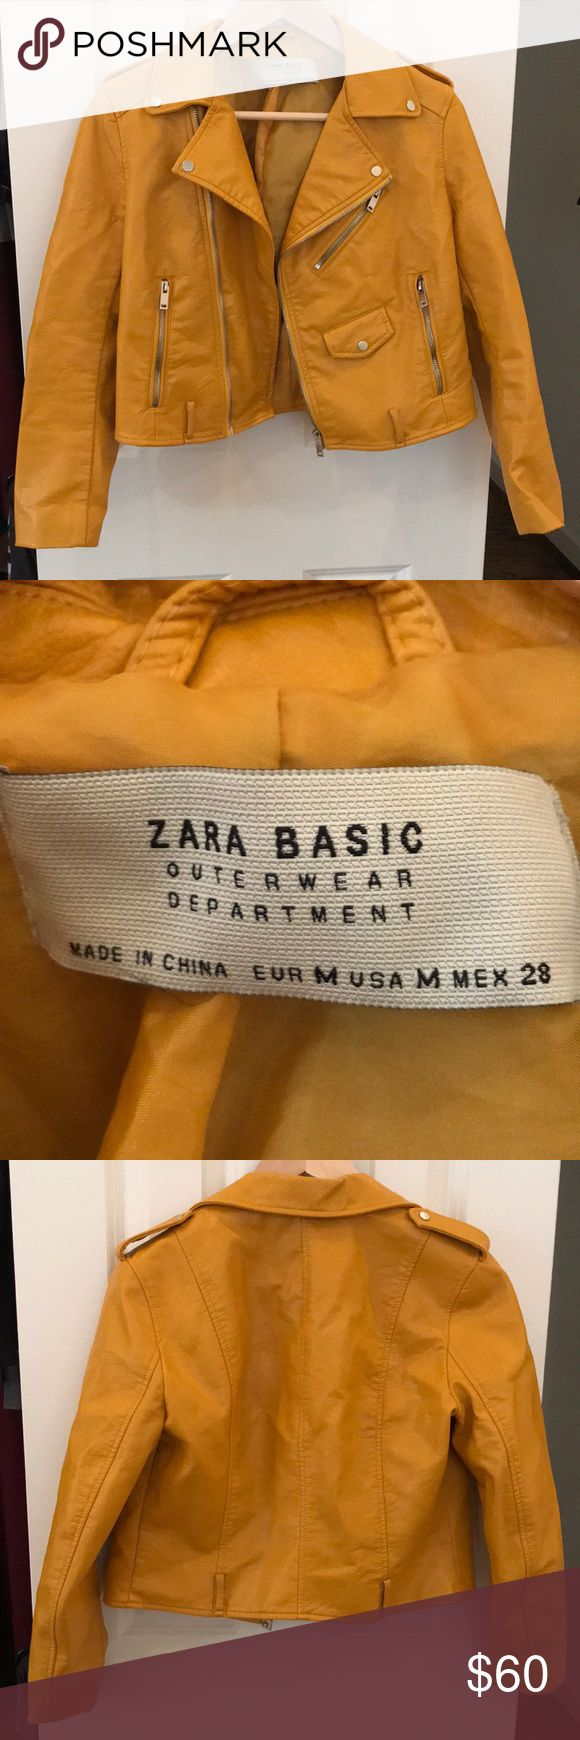 Zara Moto Jacket. Size Medium. Zara Moto Jacket. Size Medium. Faux Leather. Only worn a few times for a few hours. Great condition. Zara Jackets & Coats